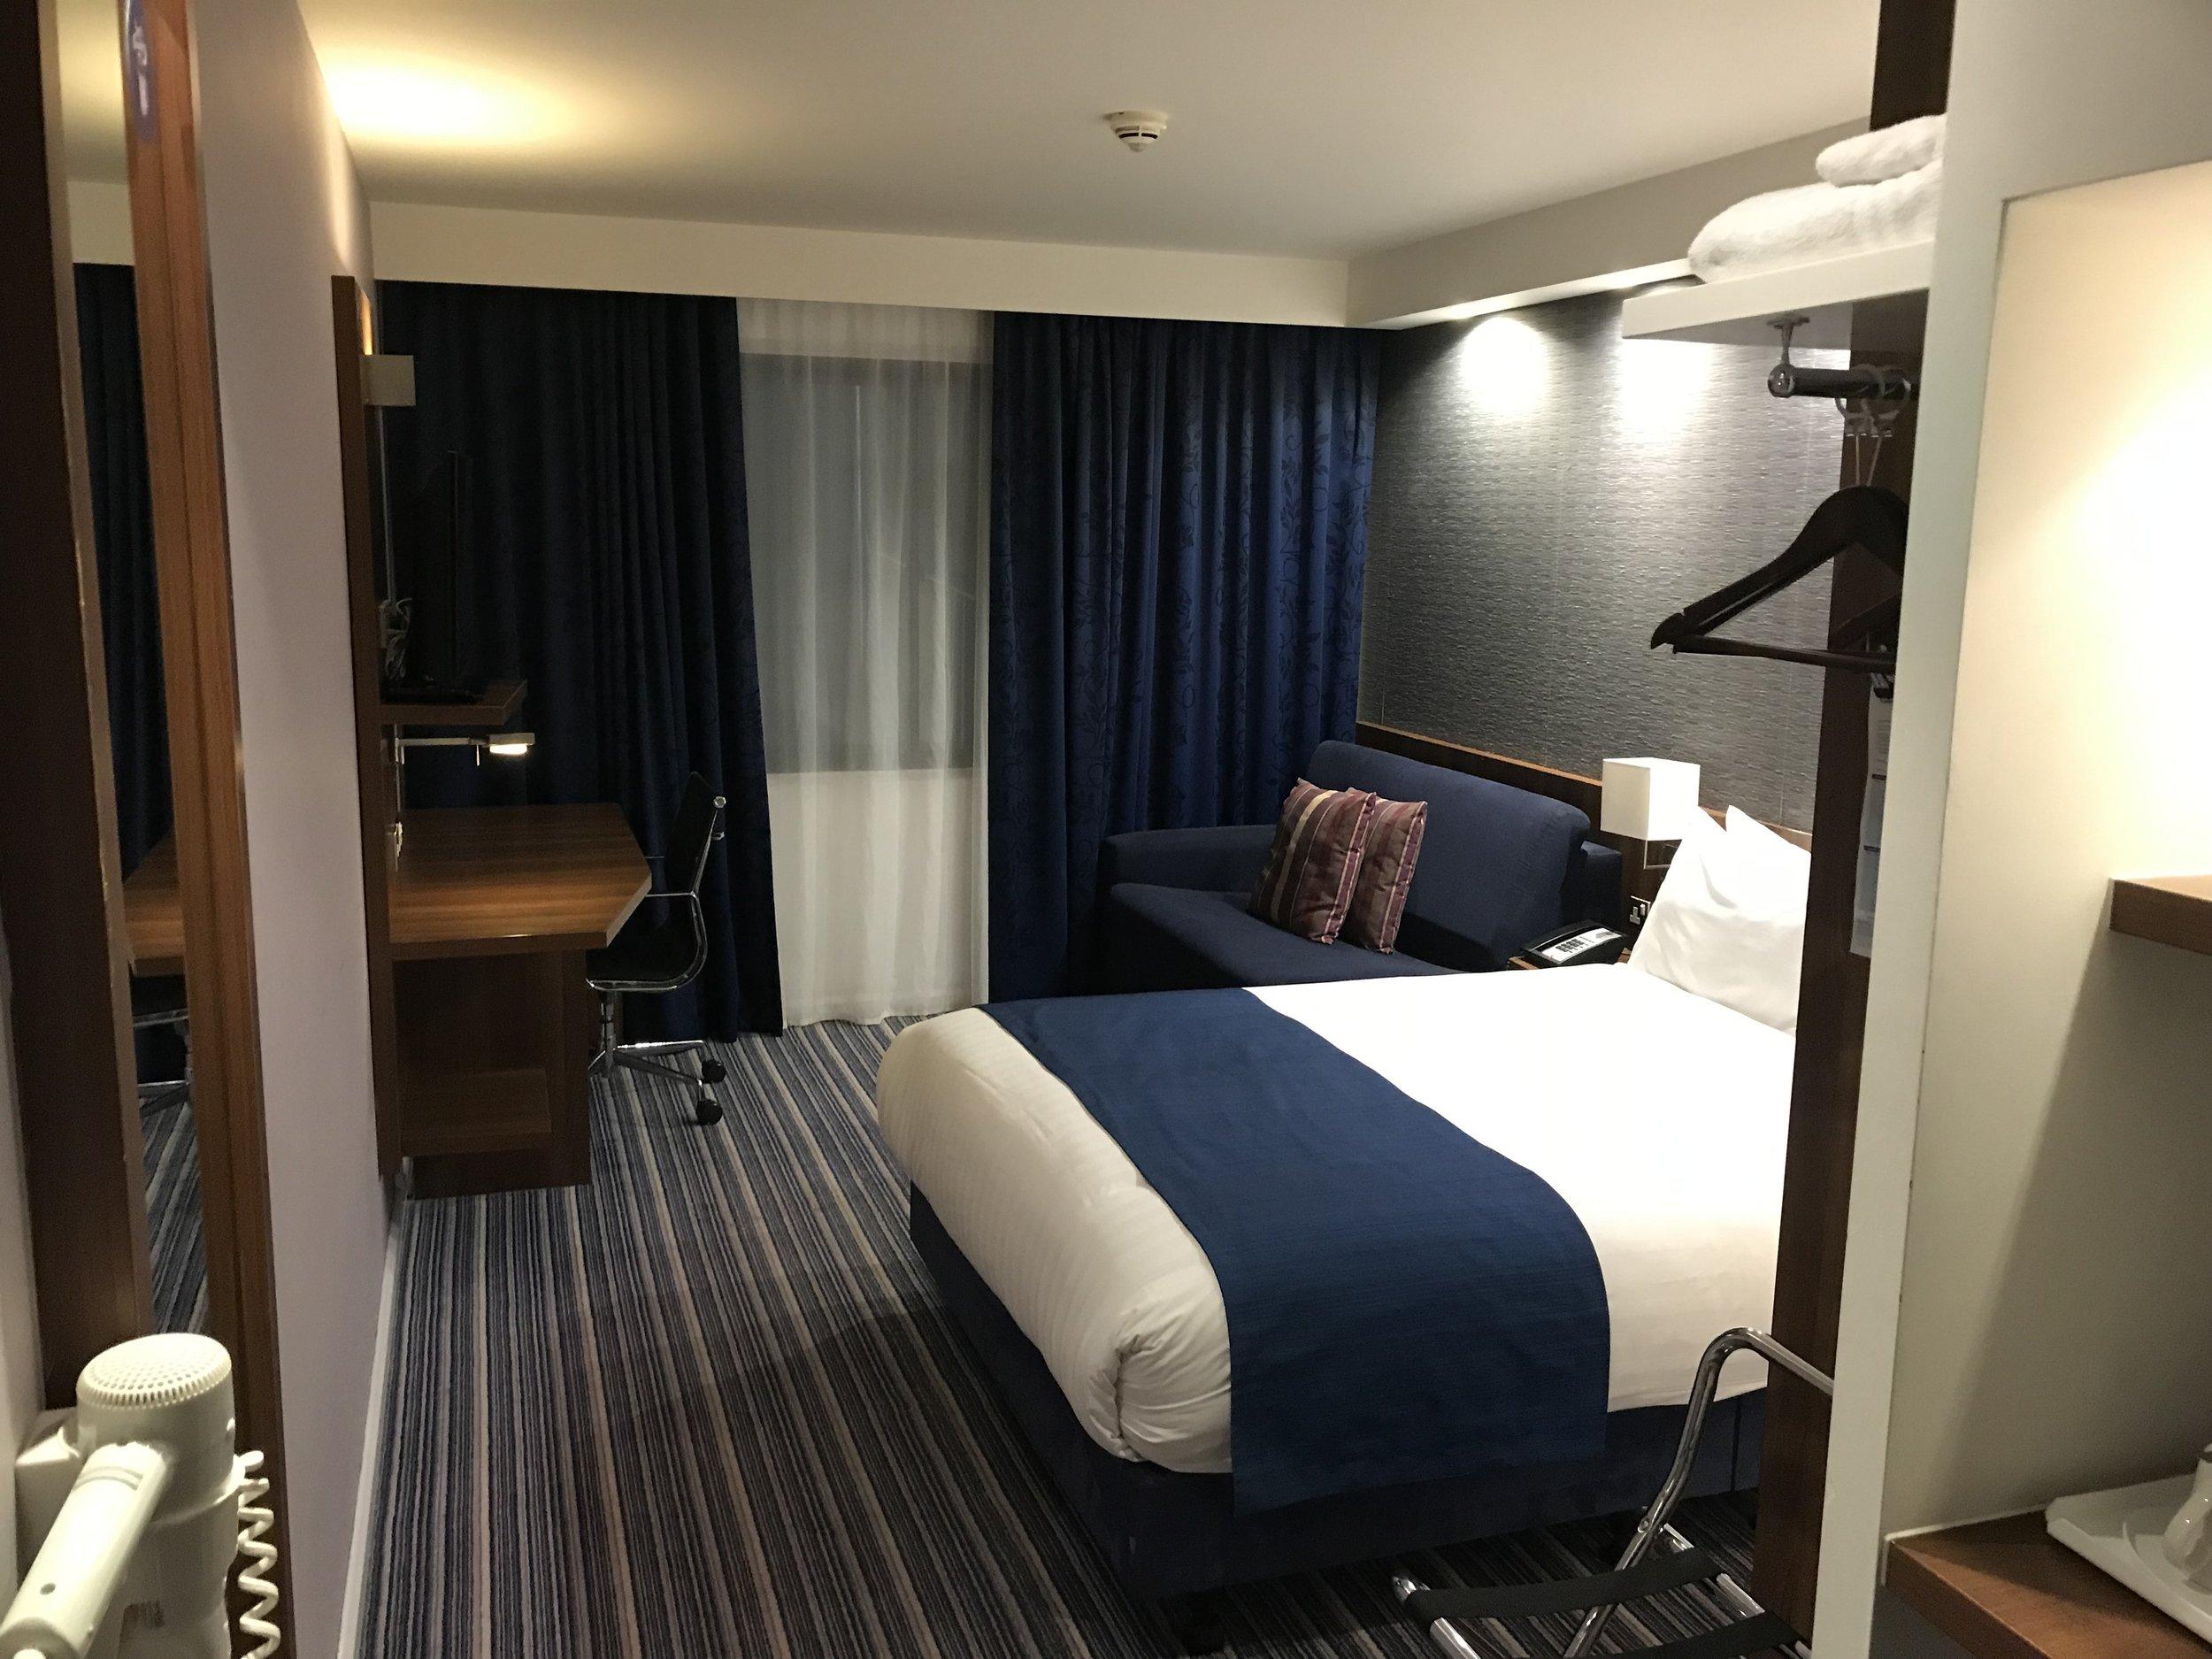 Holiday Inn Express Heathrow Terminal 5